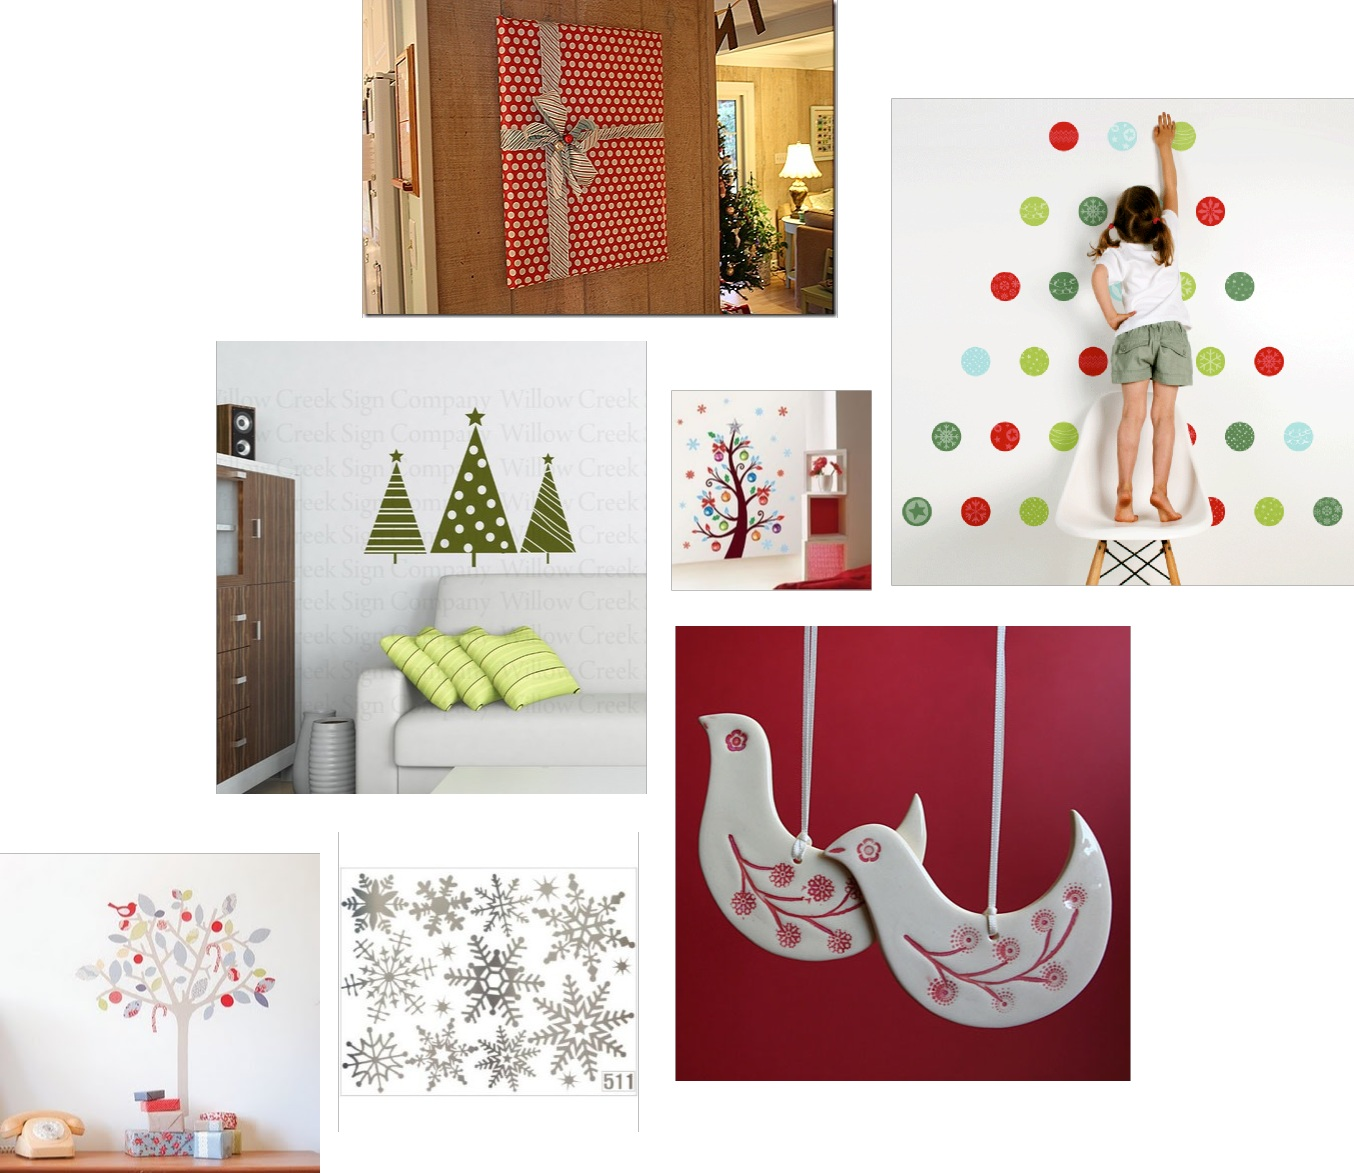 http://2.bp.blogspot.com/_QMPRLFIBqYA/TPkMo8oychI/AAAAAAAADyo/lZkGgmu31es/s1600/jennifer_holiday_ideas.jpg